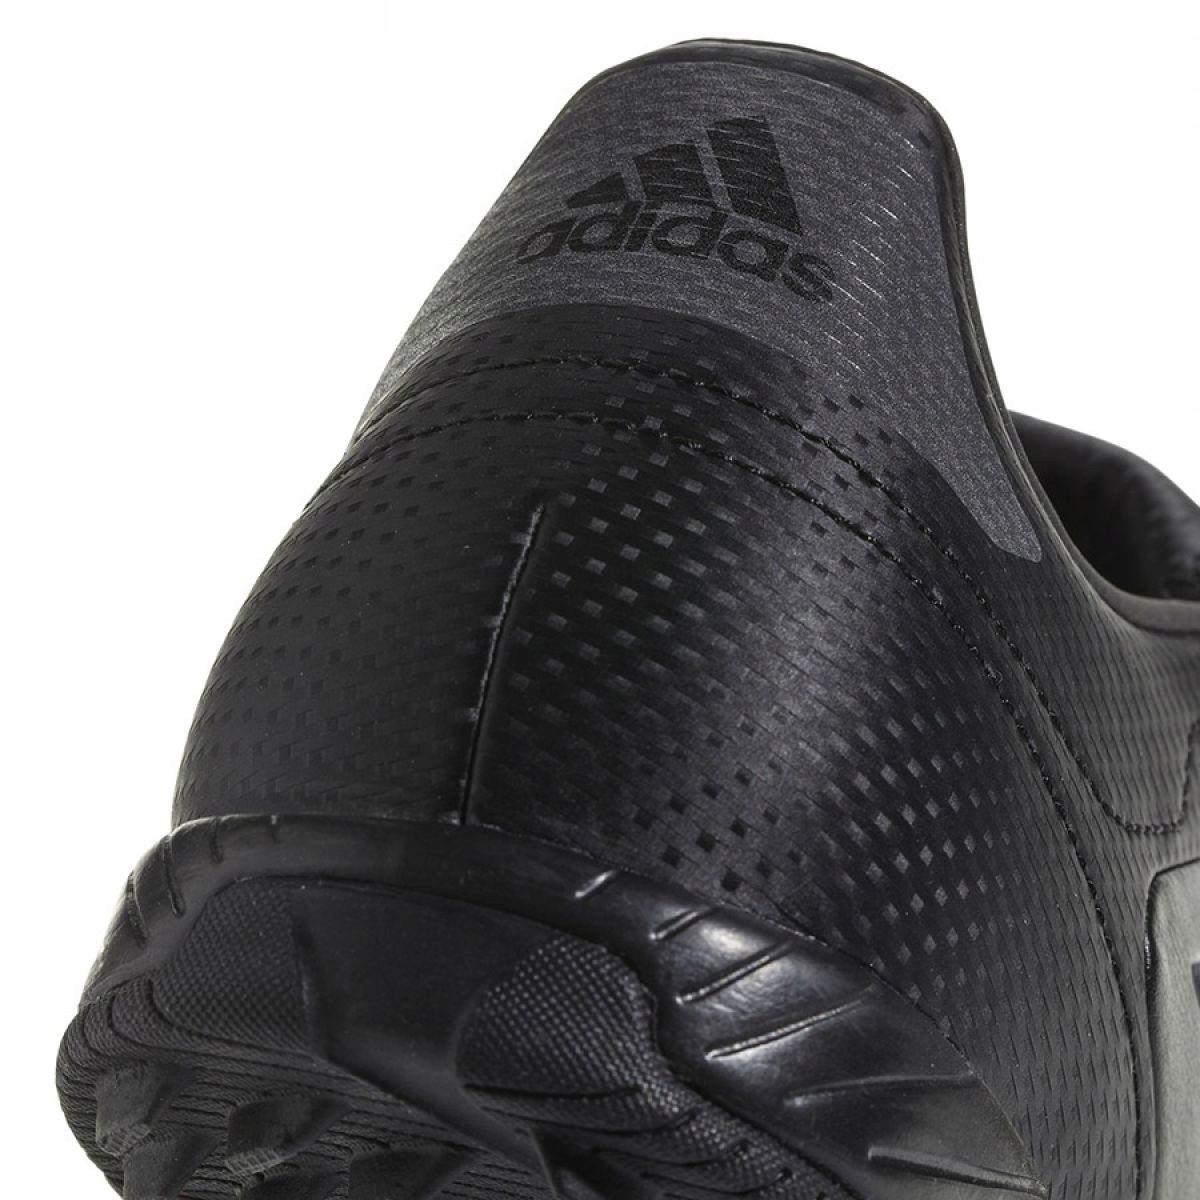 save off 34851 aa8e9 Buty piłkarskie adidas Copa Tango 18 CP902 47 13 (7366676560)